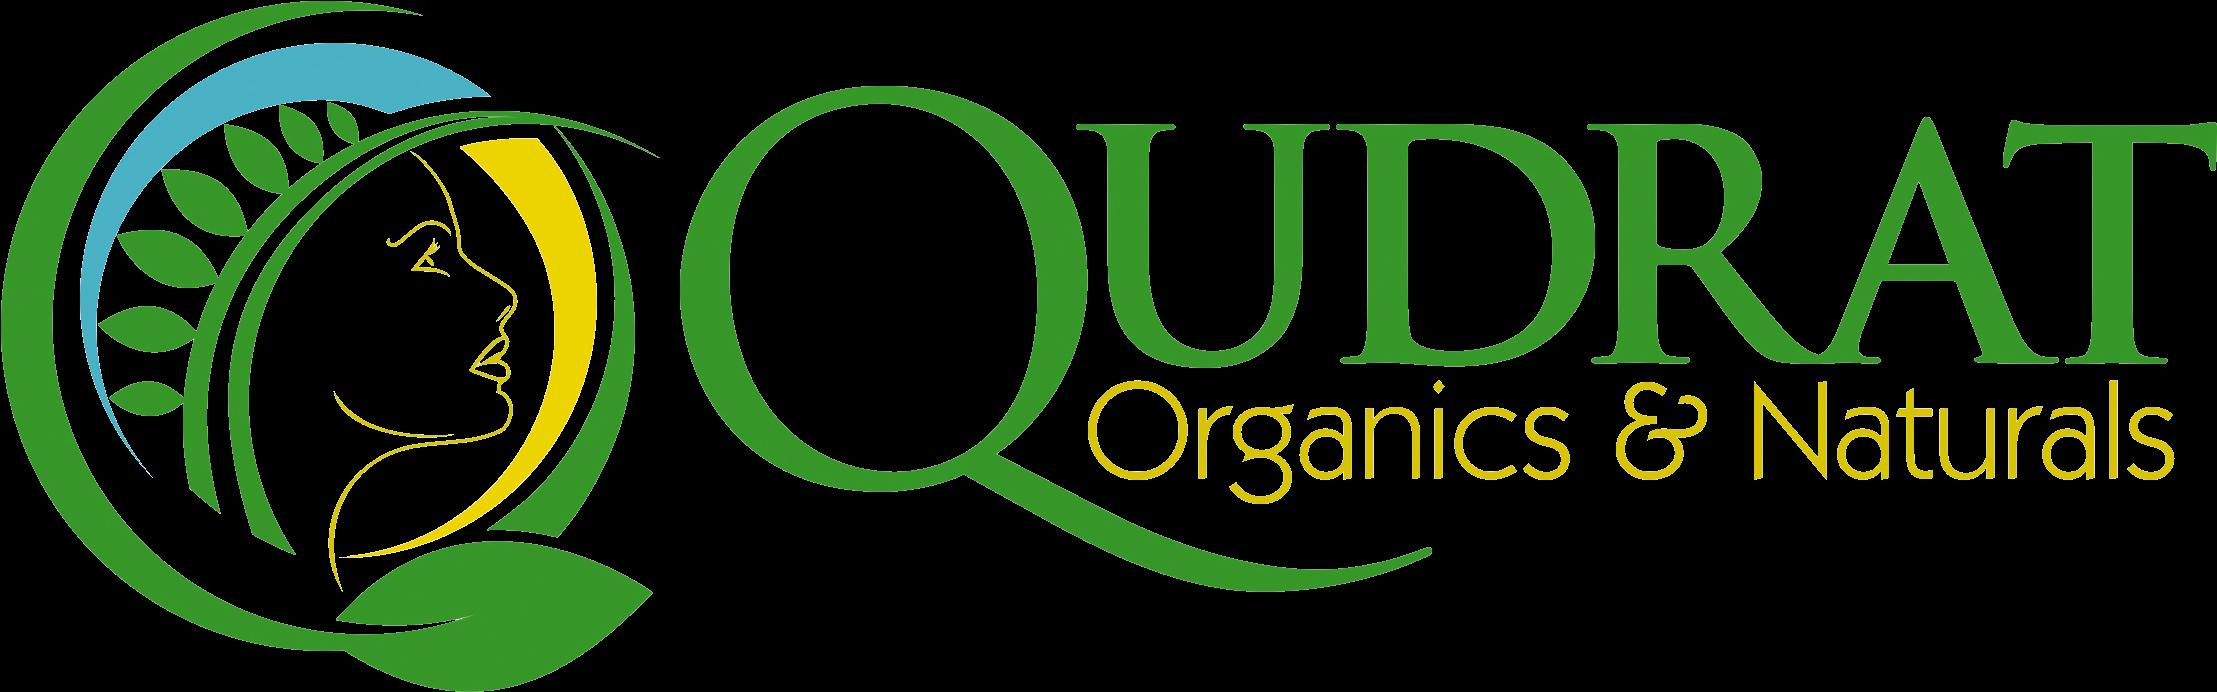 Baby Wash Logo Clipart Library Organic Johnson And.